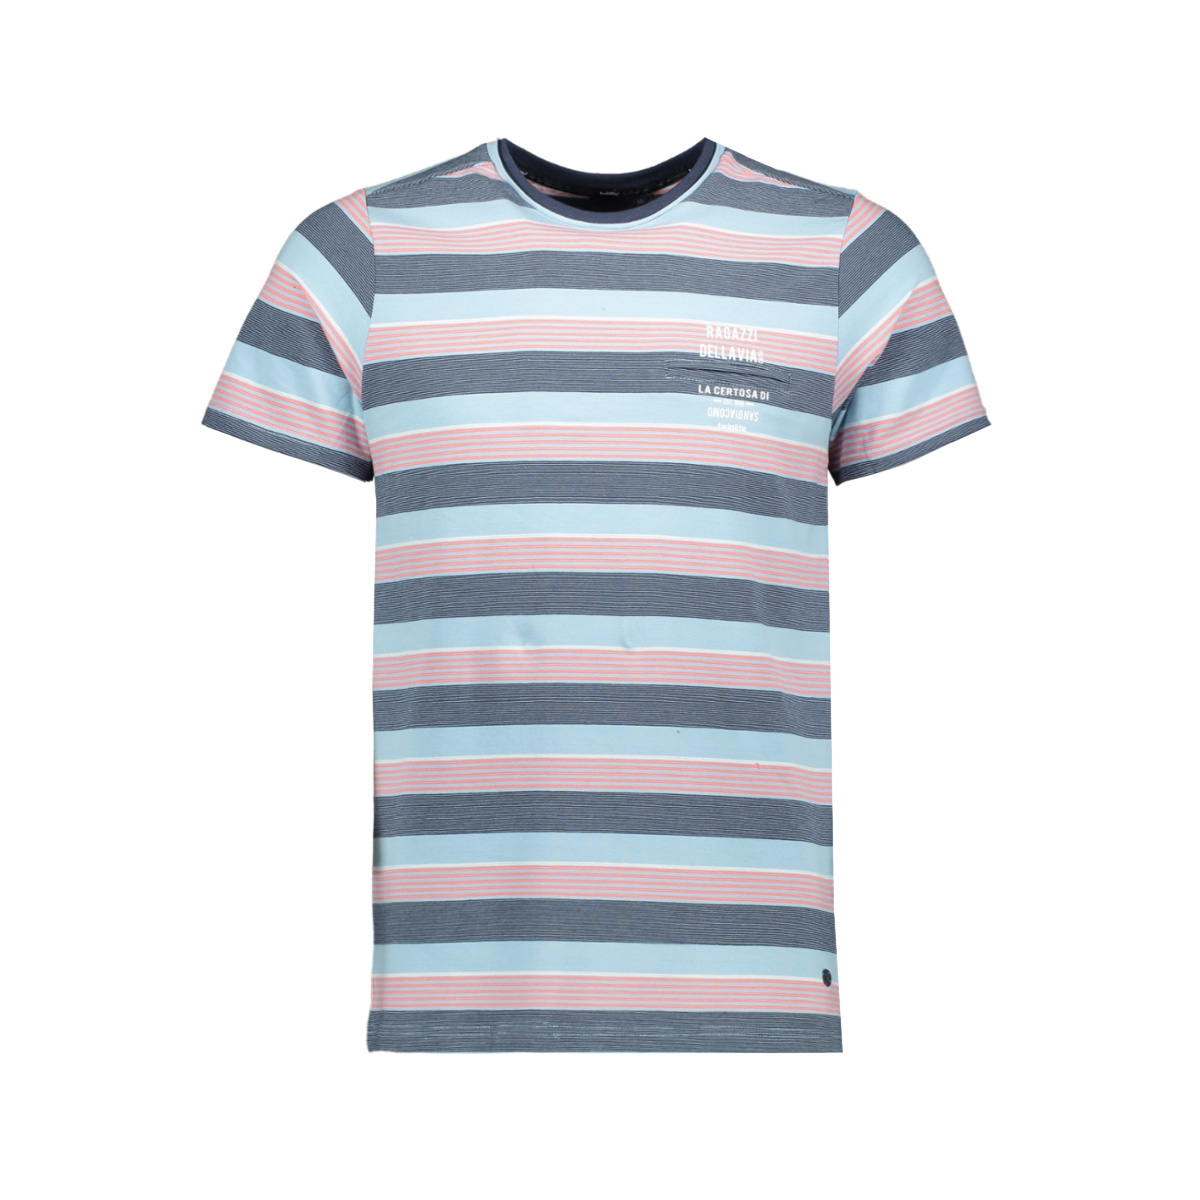 t shirt 1901 5170 m 2 twinlife t-shirt 6013 dreamblue